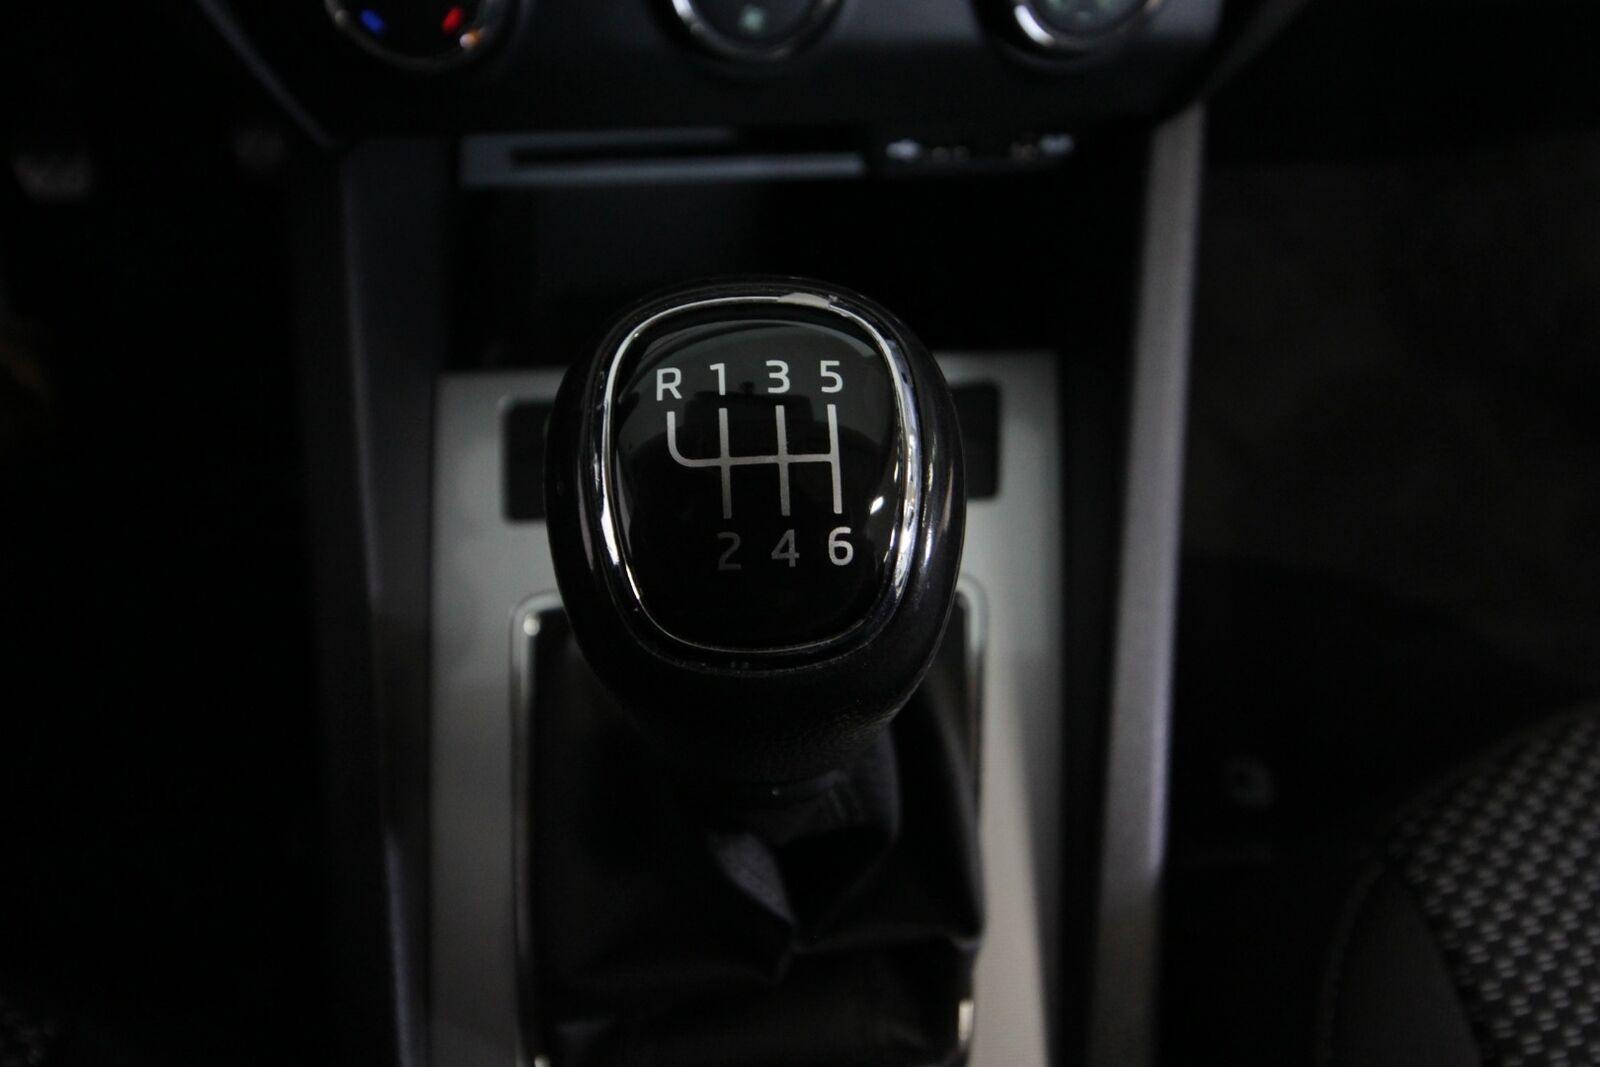 Skoda Octavia TDi 150 Ambition Combi